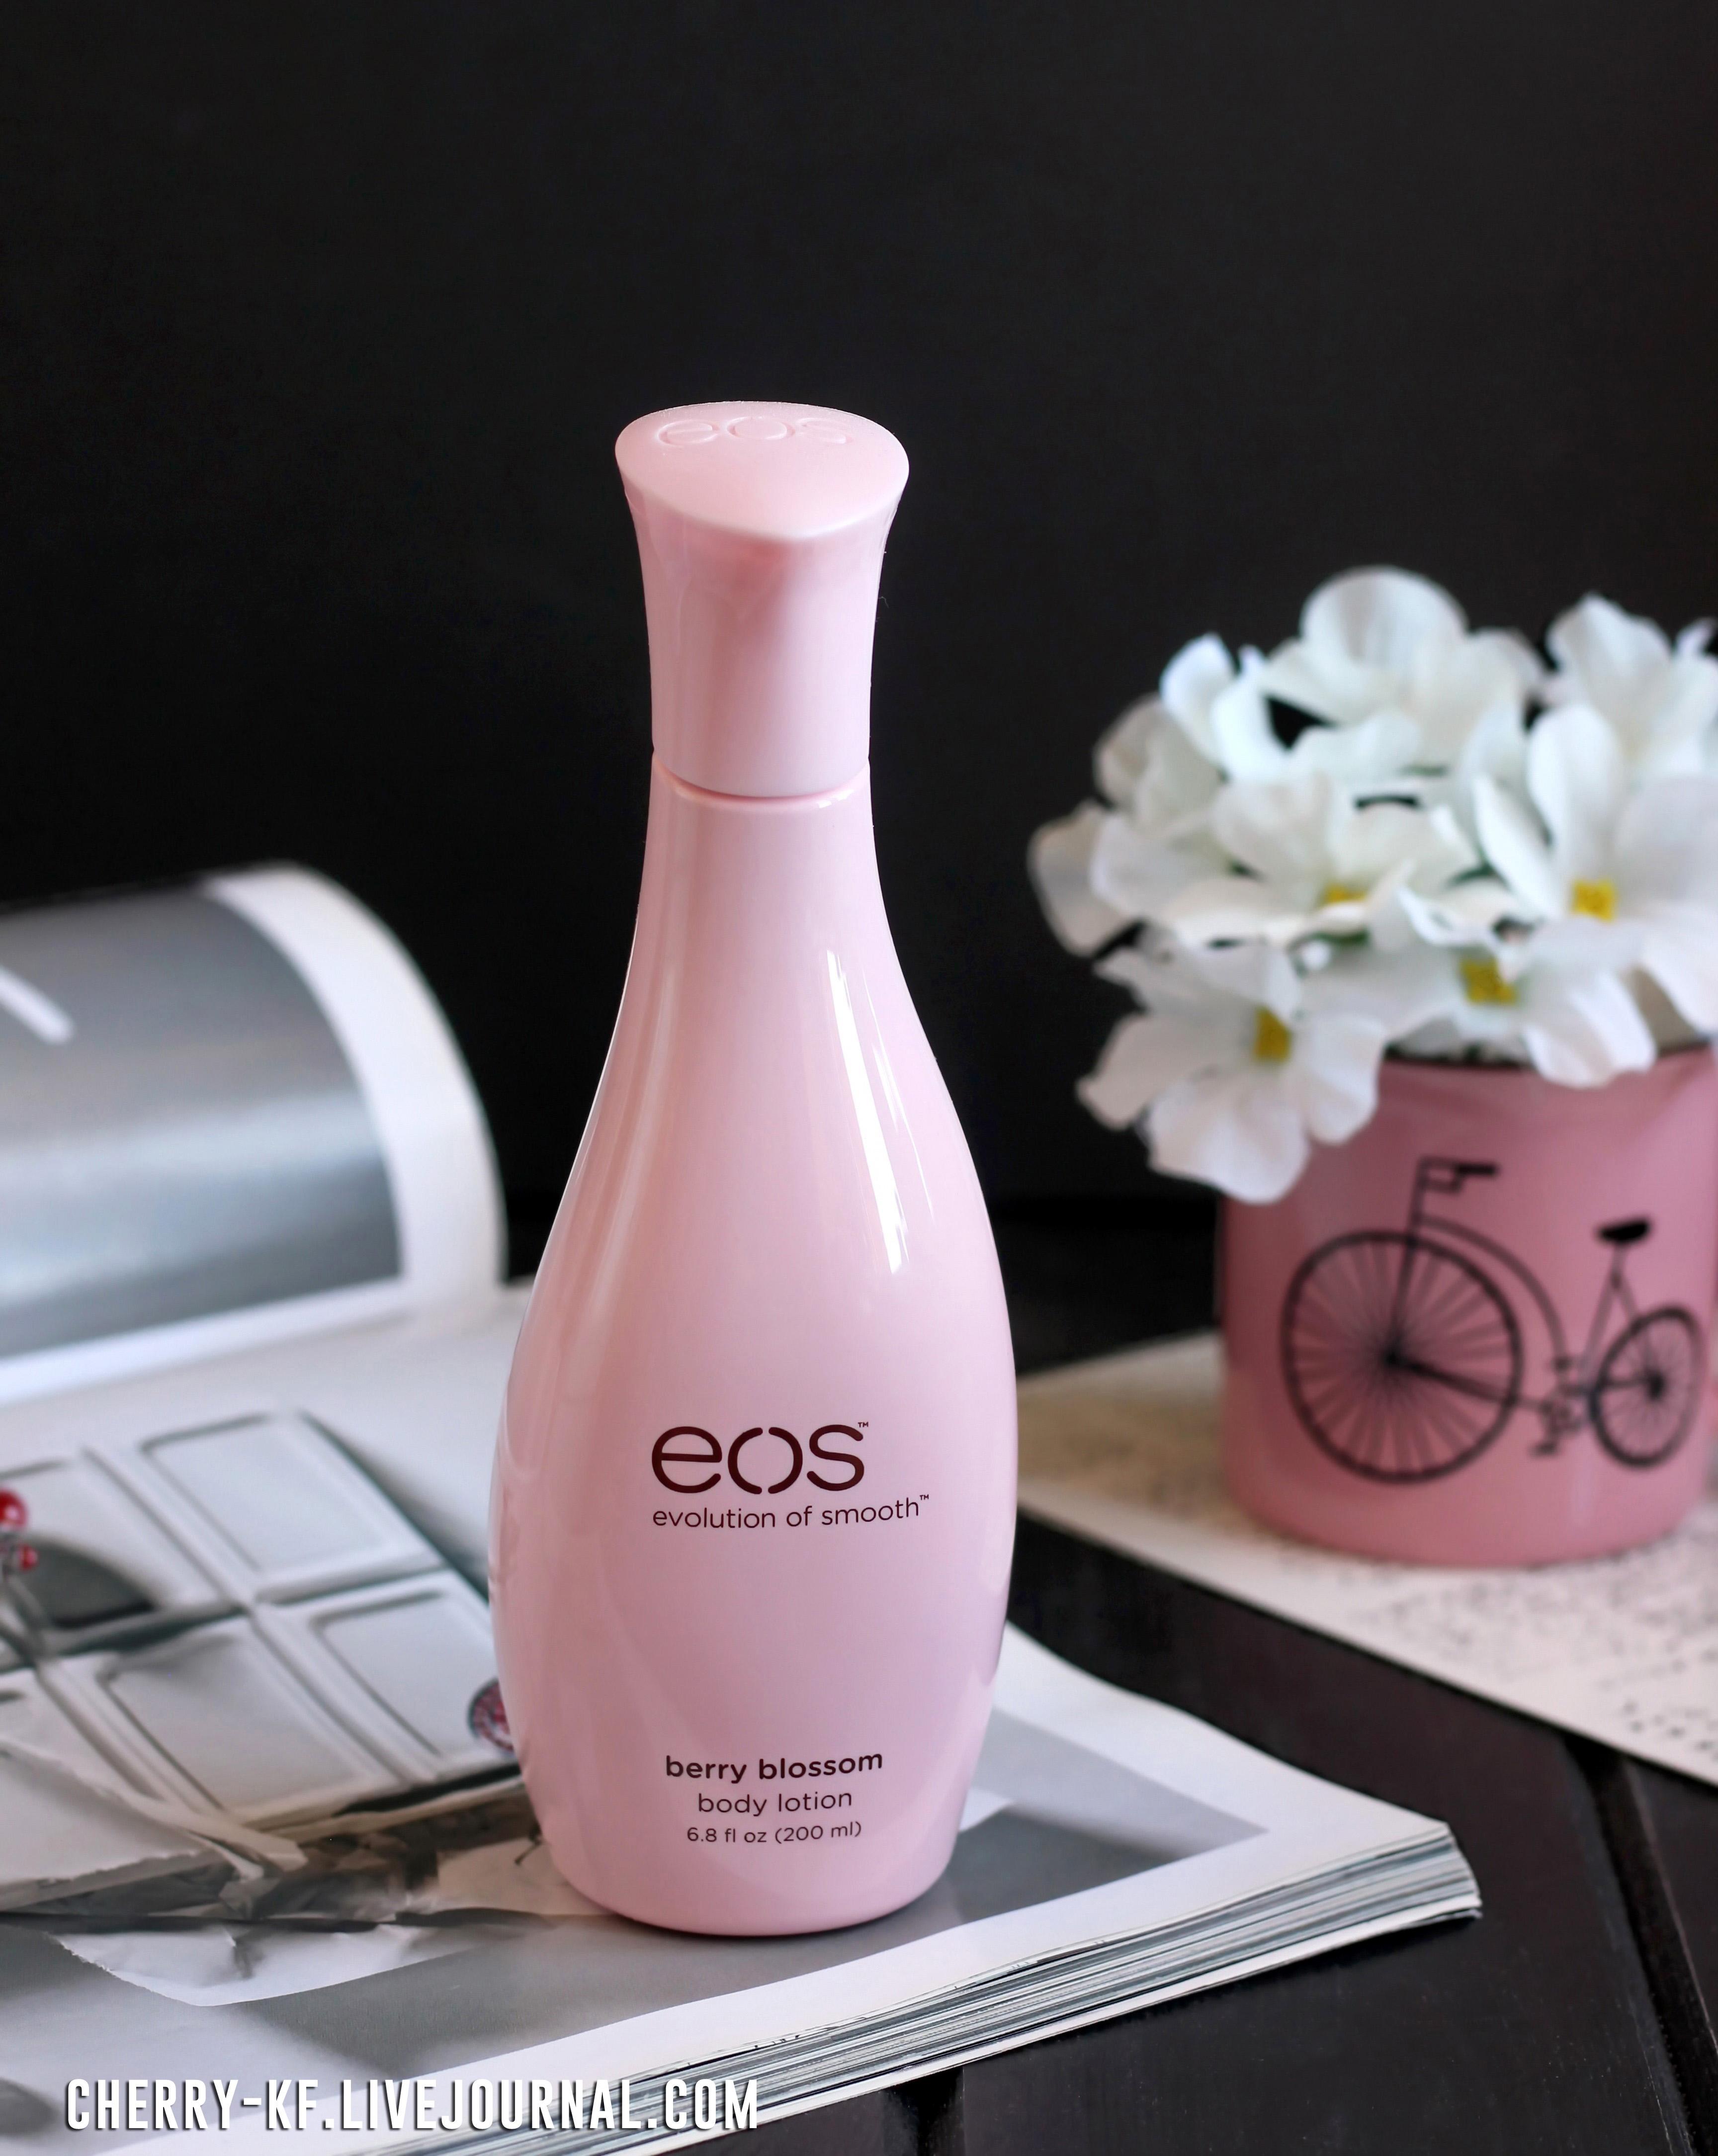 EOS, Body Lotion, Berry Blossom отзывы лосьон Эос.jpg